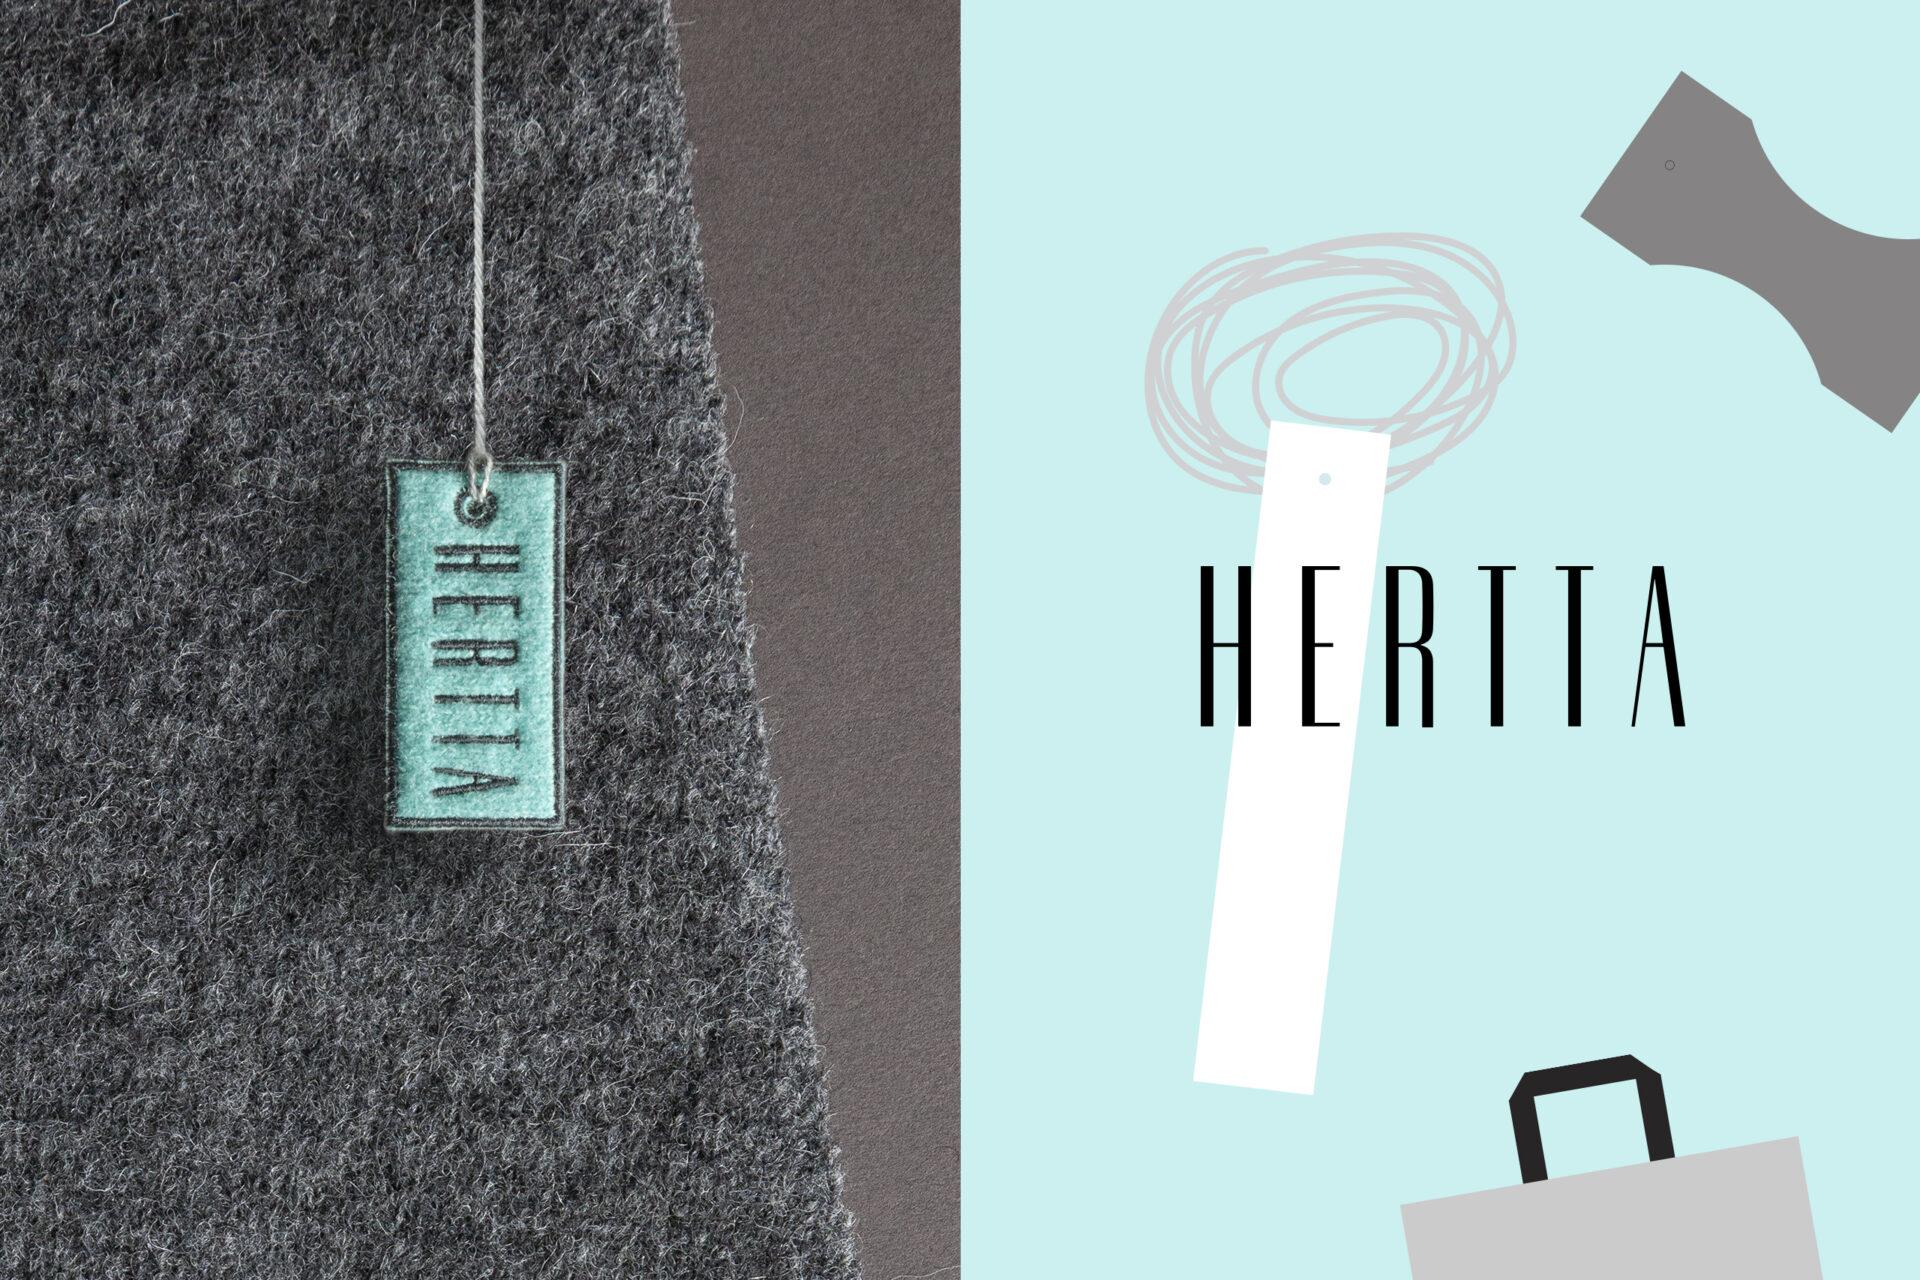 Visuaalne identiteet, logo ja bränding - Hertta Knitwear